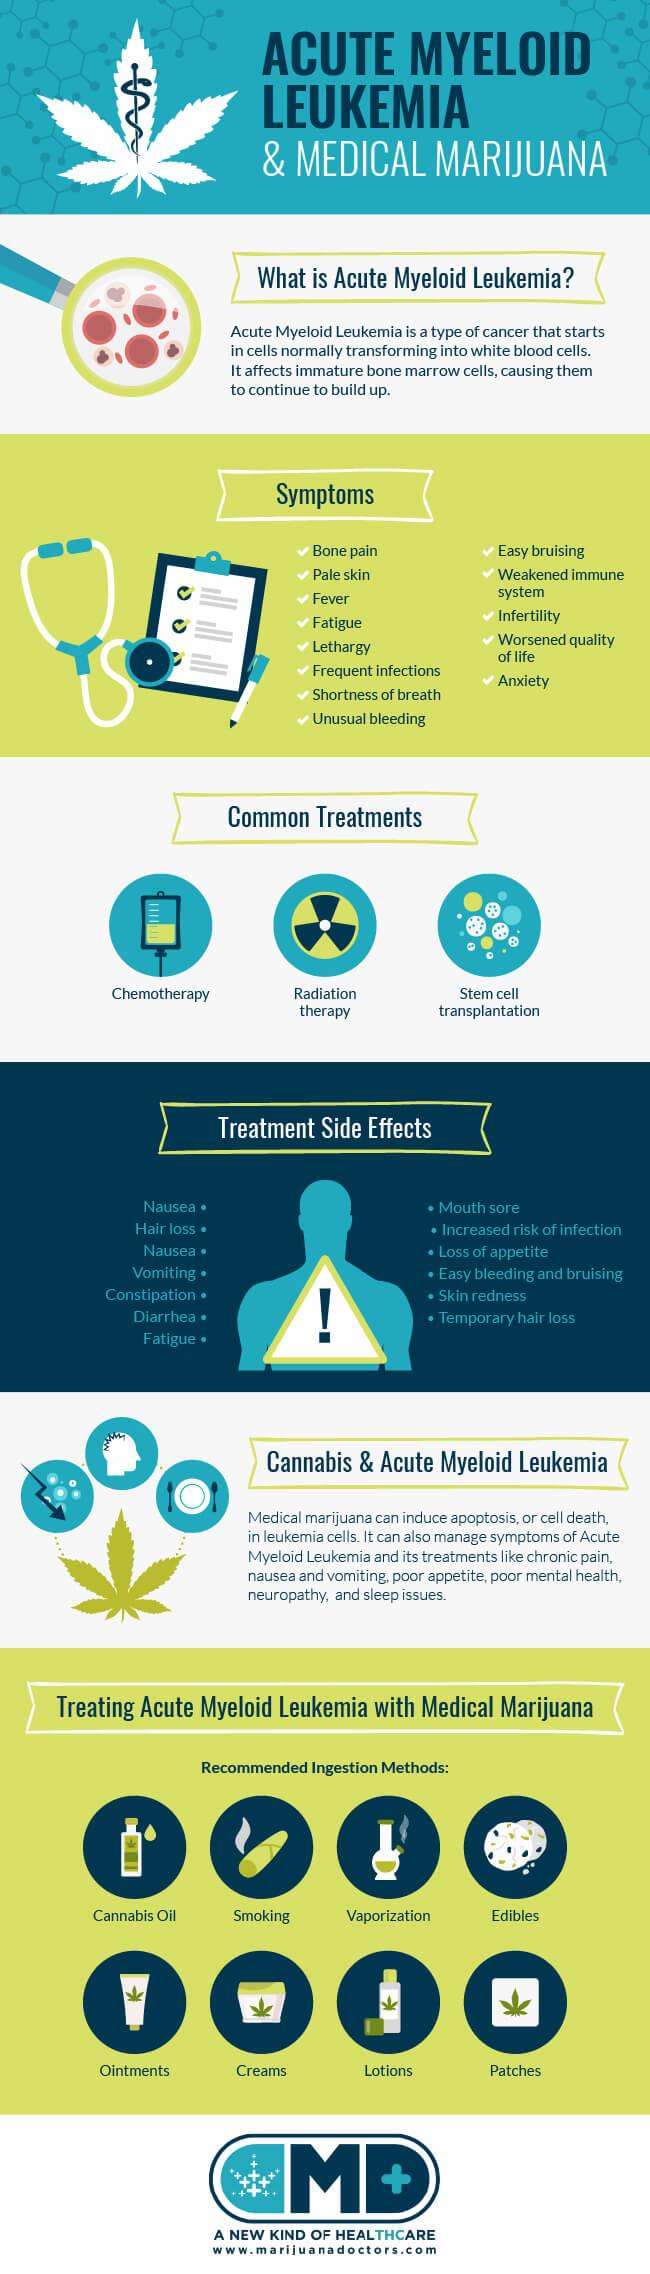 Medical Marijuana and Acute Myeloid Leukemia